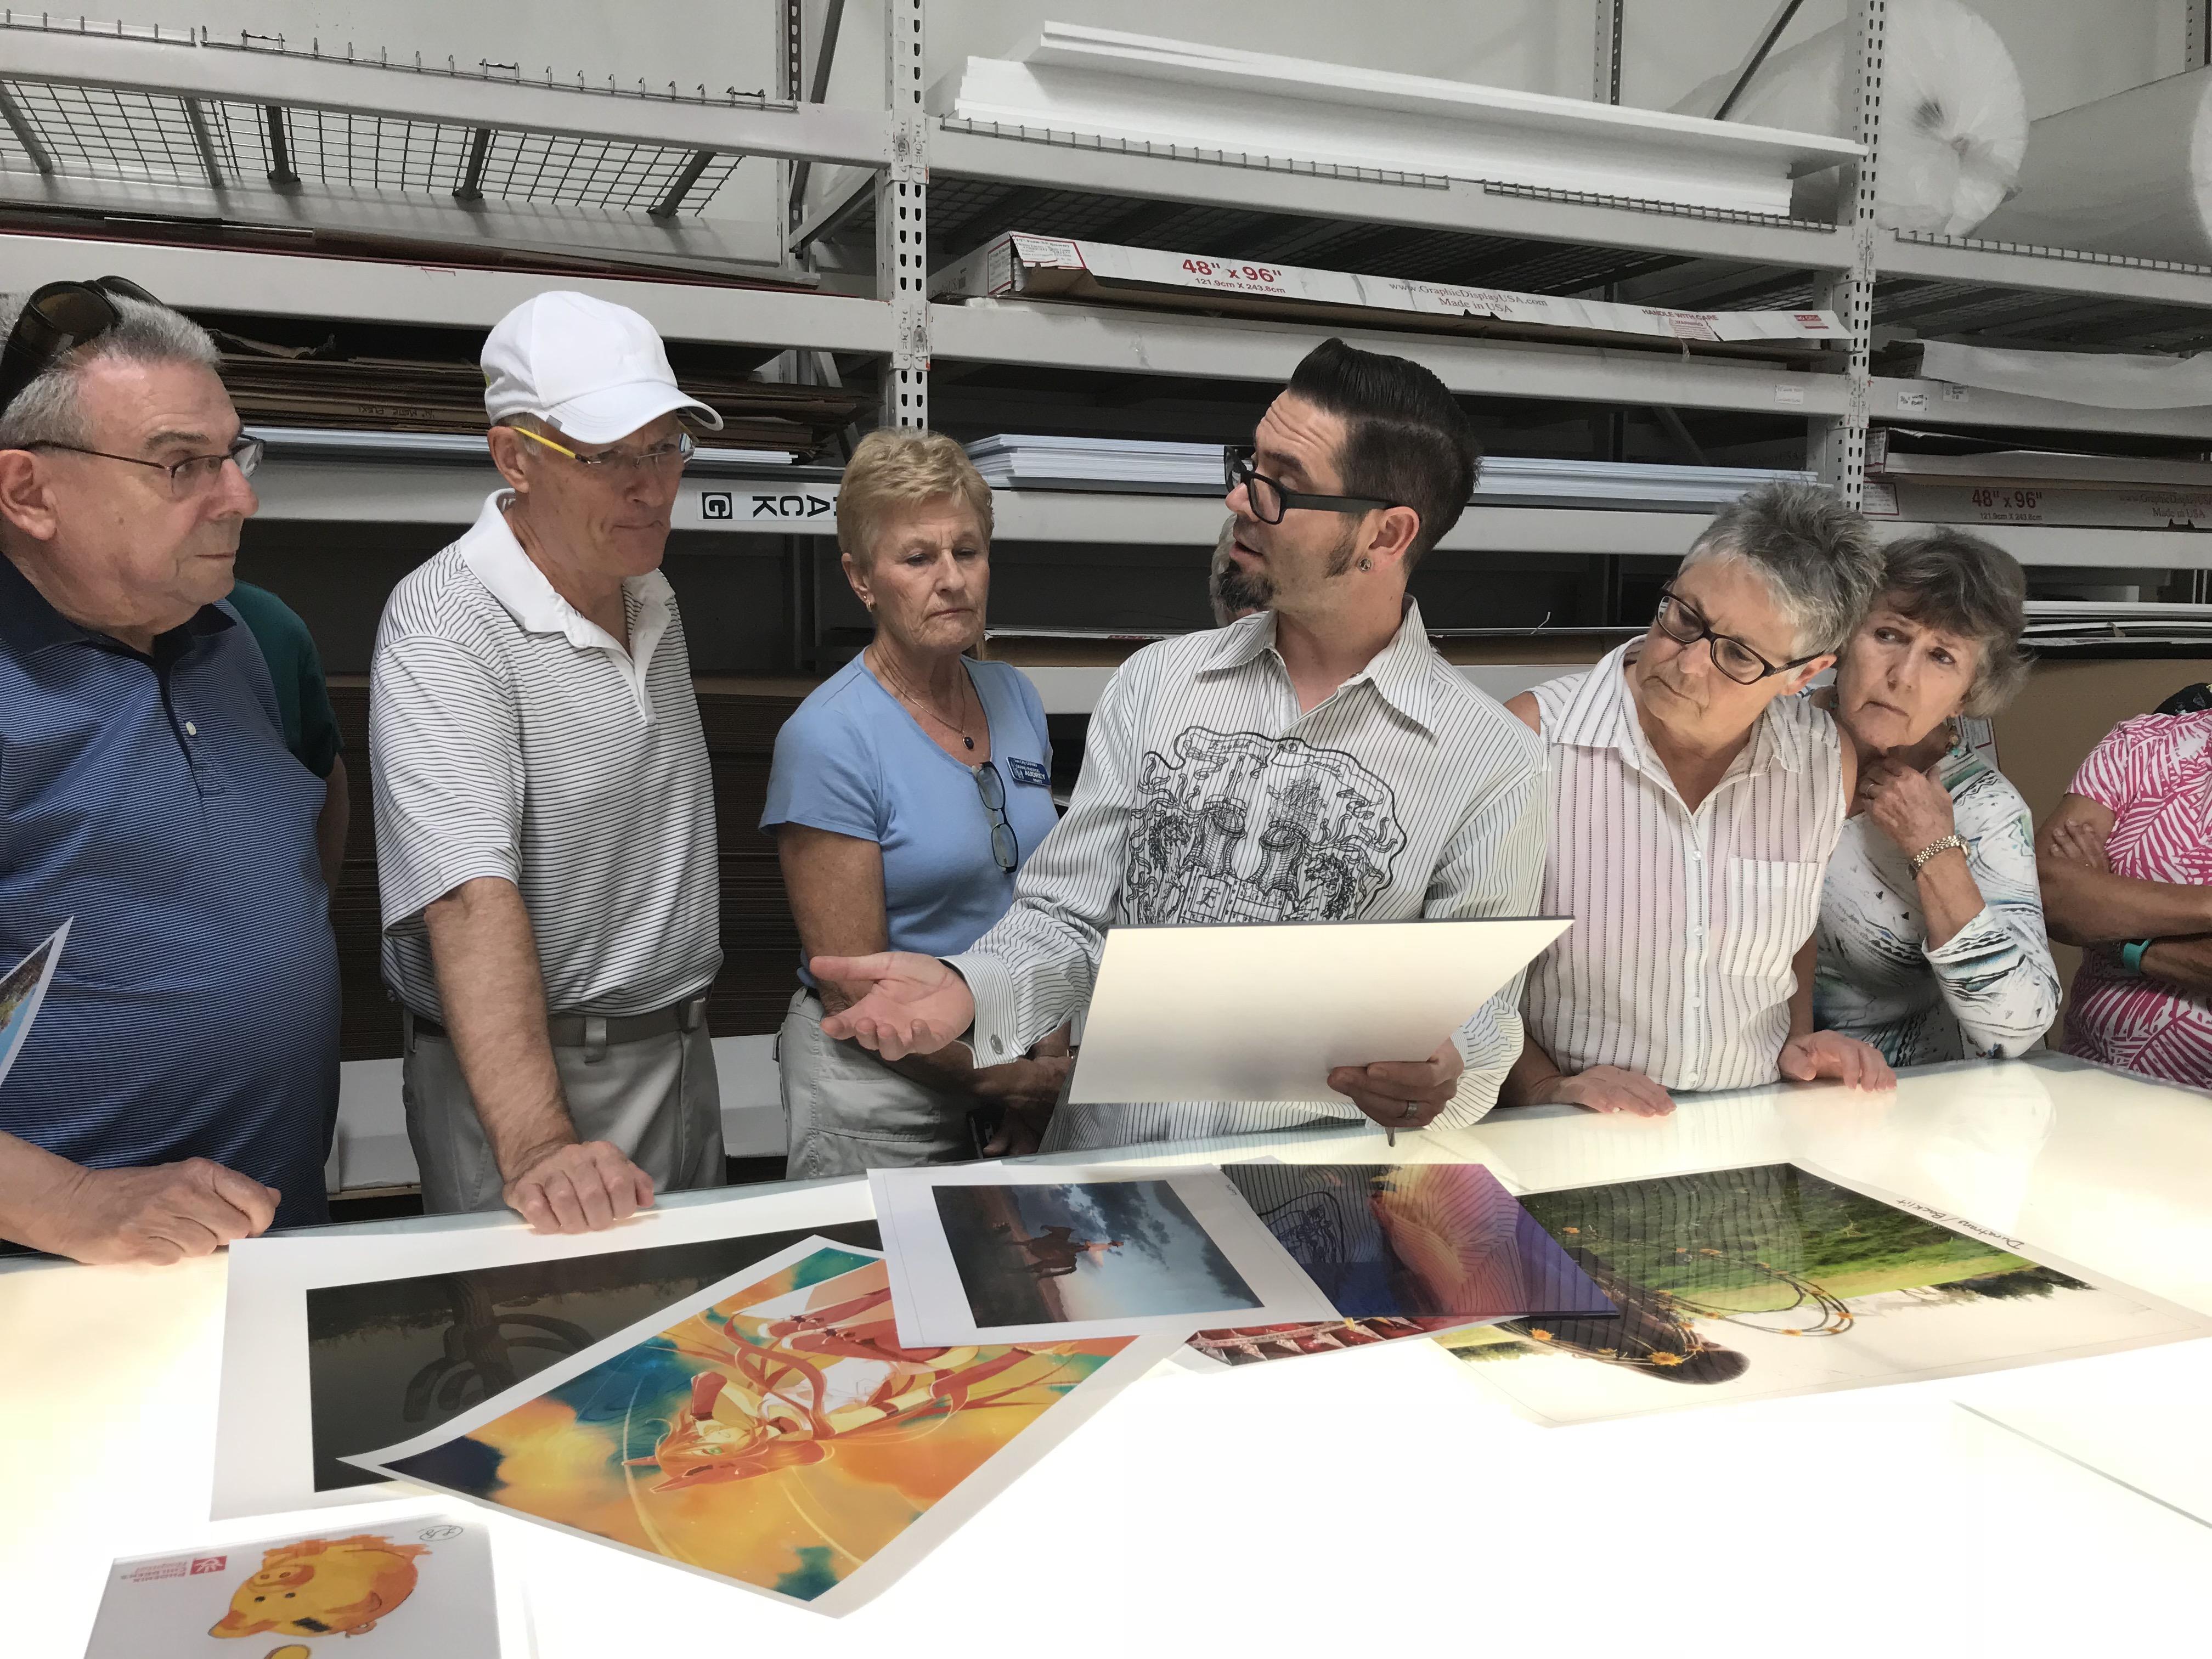 ArtisanHD Print Shop Tour